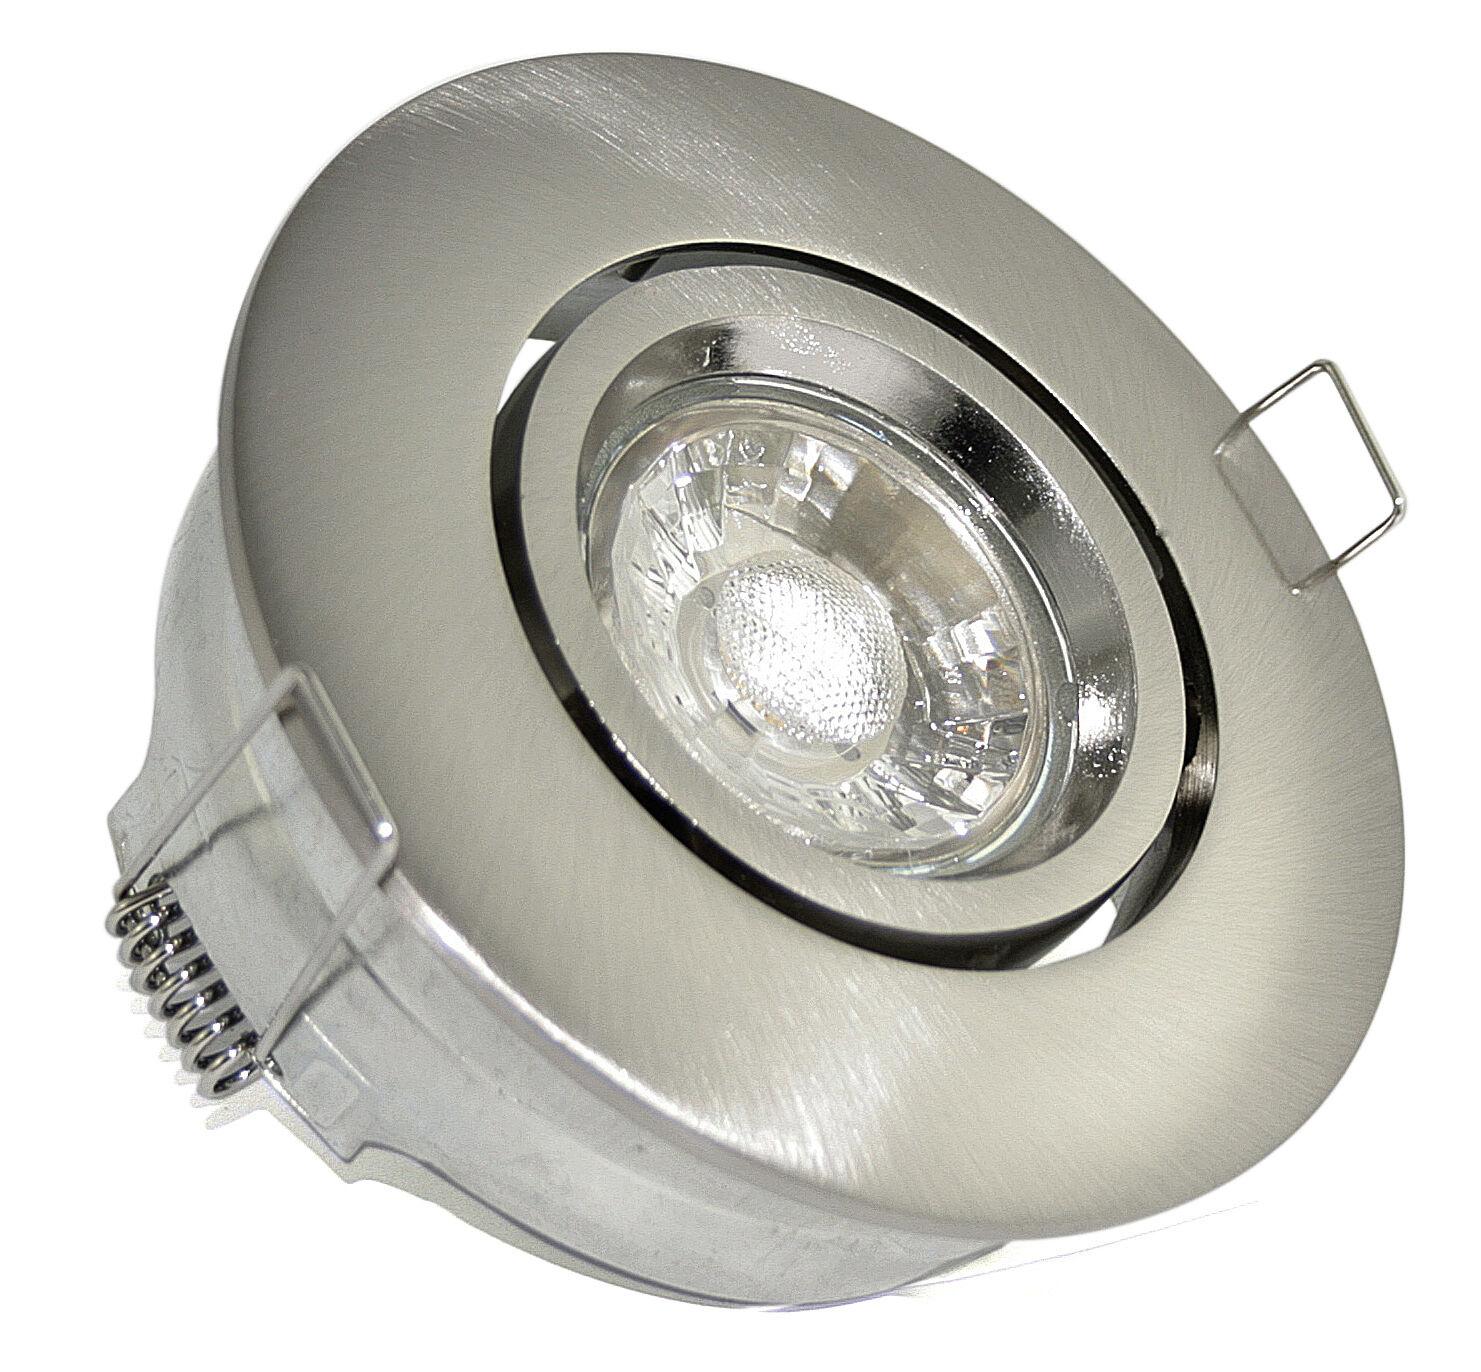 230V 230V 230V XXL Einbaulampe Toni & 5W Power LED GU10 Leuchtmittel, Lochmaß 90mm | Toy Story  | Internationale Wahl  | Ermäßigung  c7d286